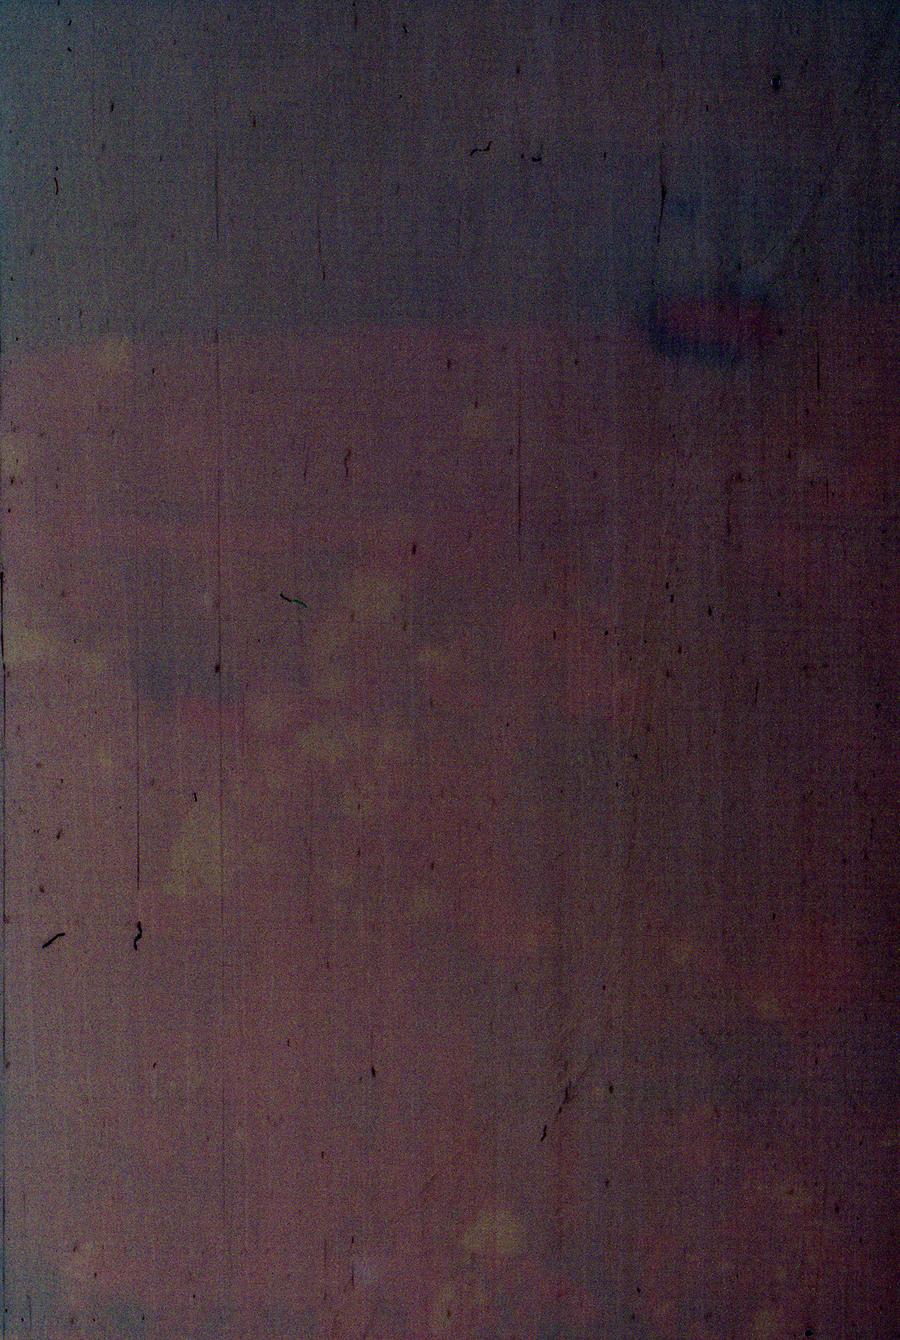 Grainy Film Texture Grainy Color Film Texture